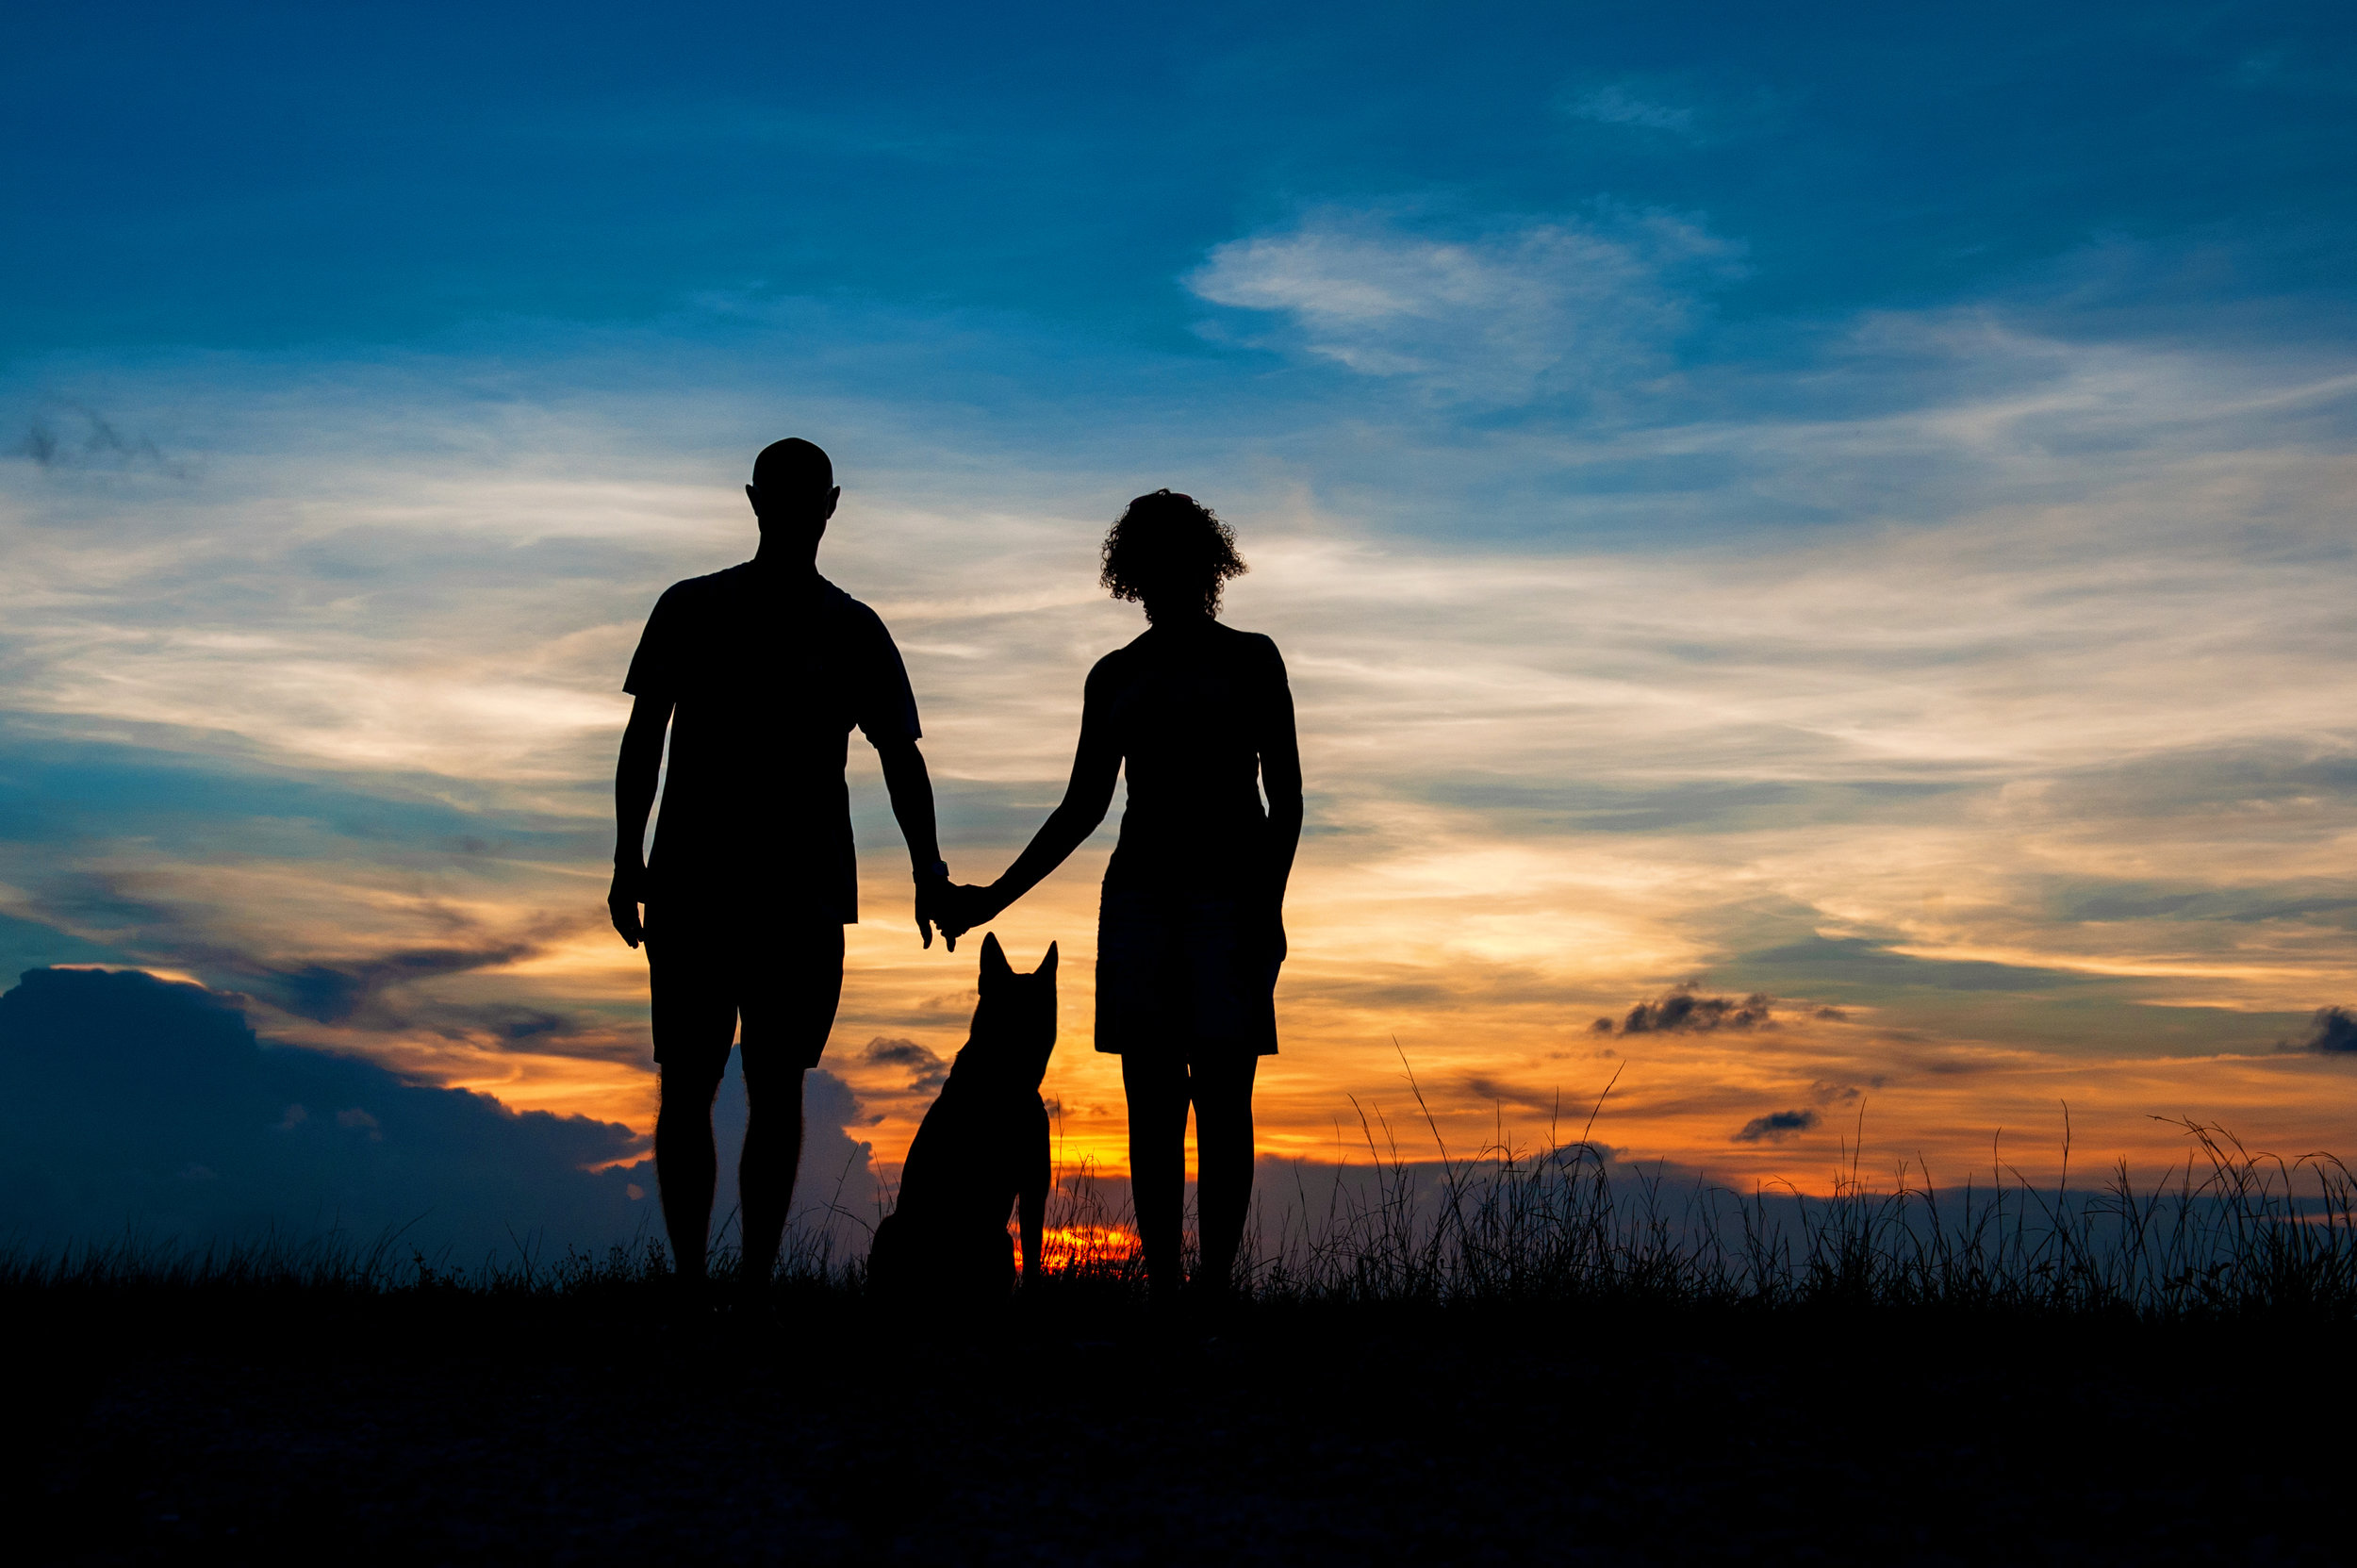 Paola-Paladini-Sunset-Silhouettes-Dog-Couple-Holding-Hands